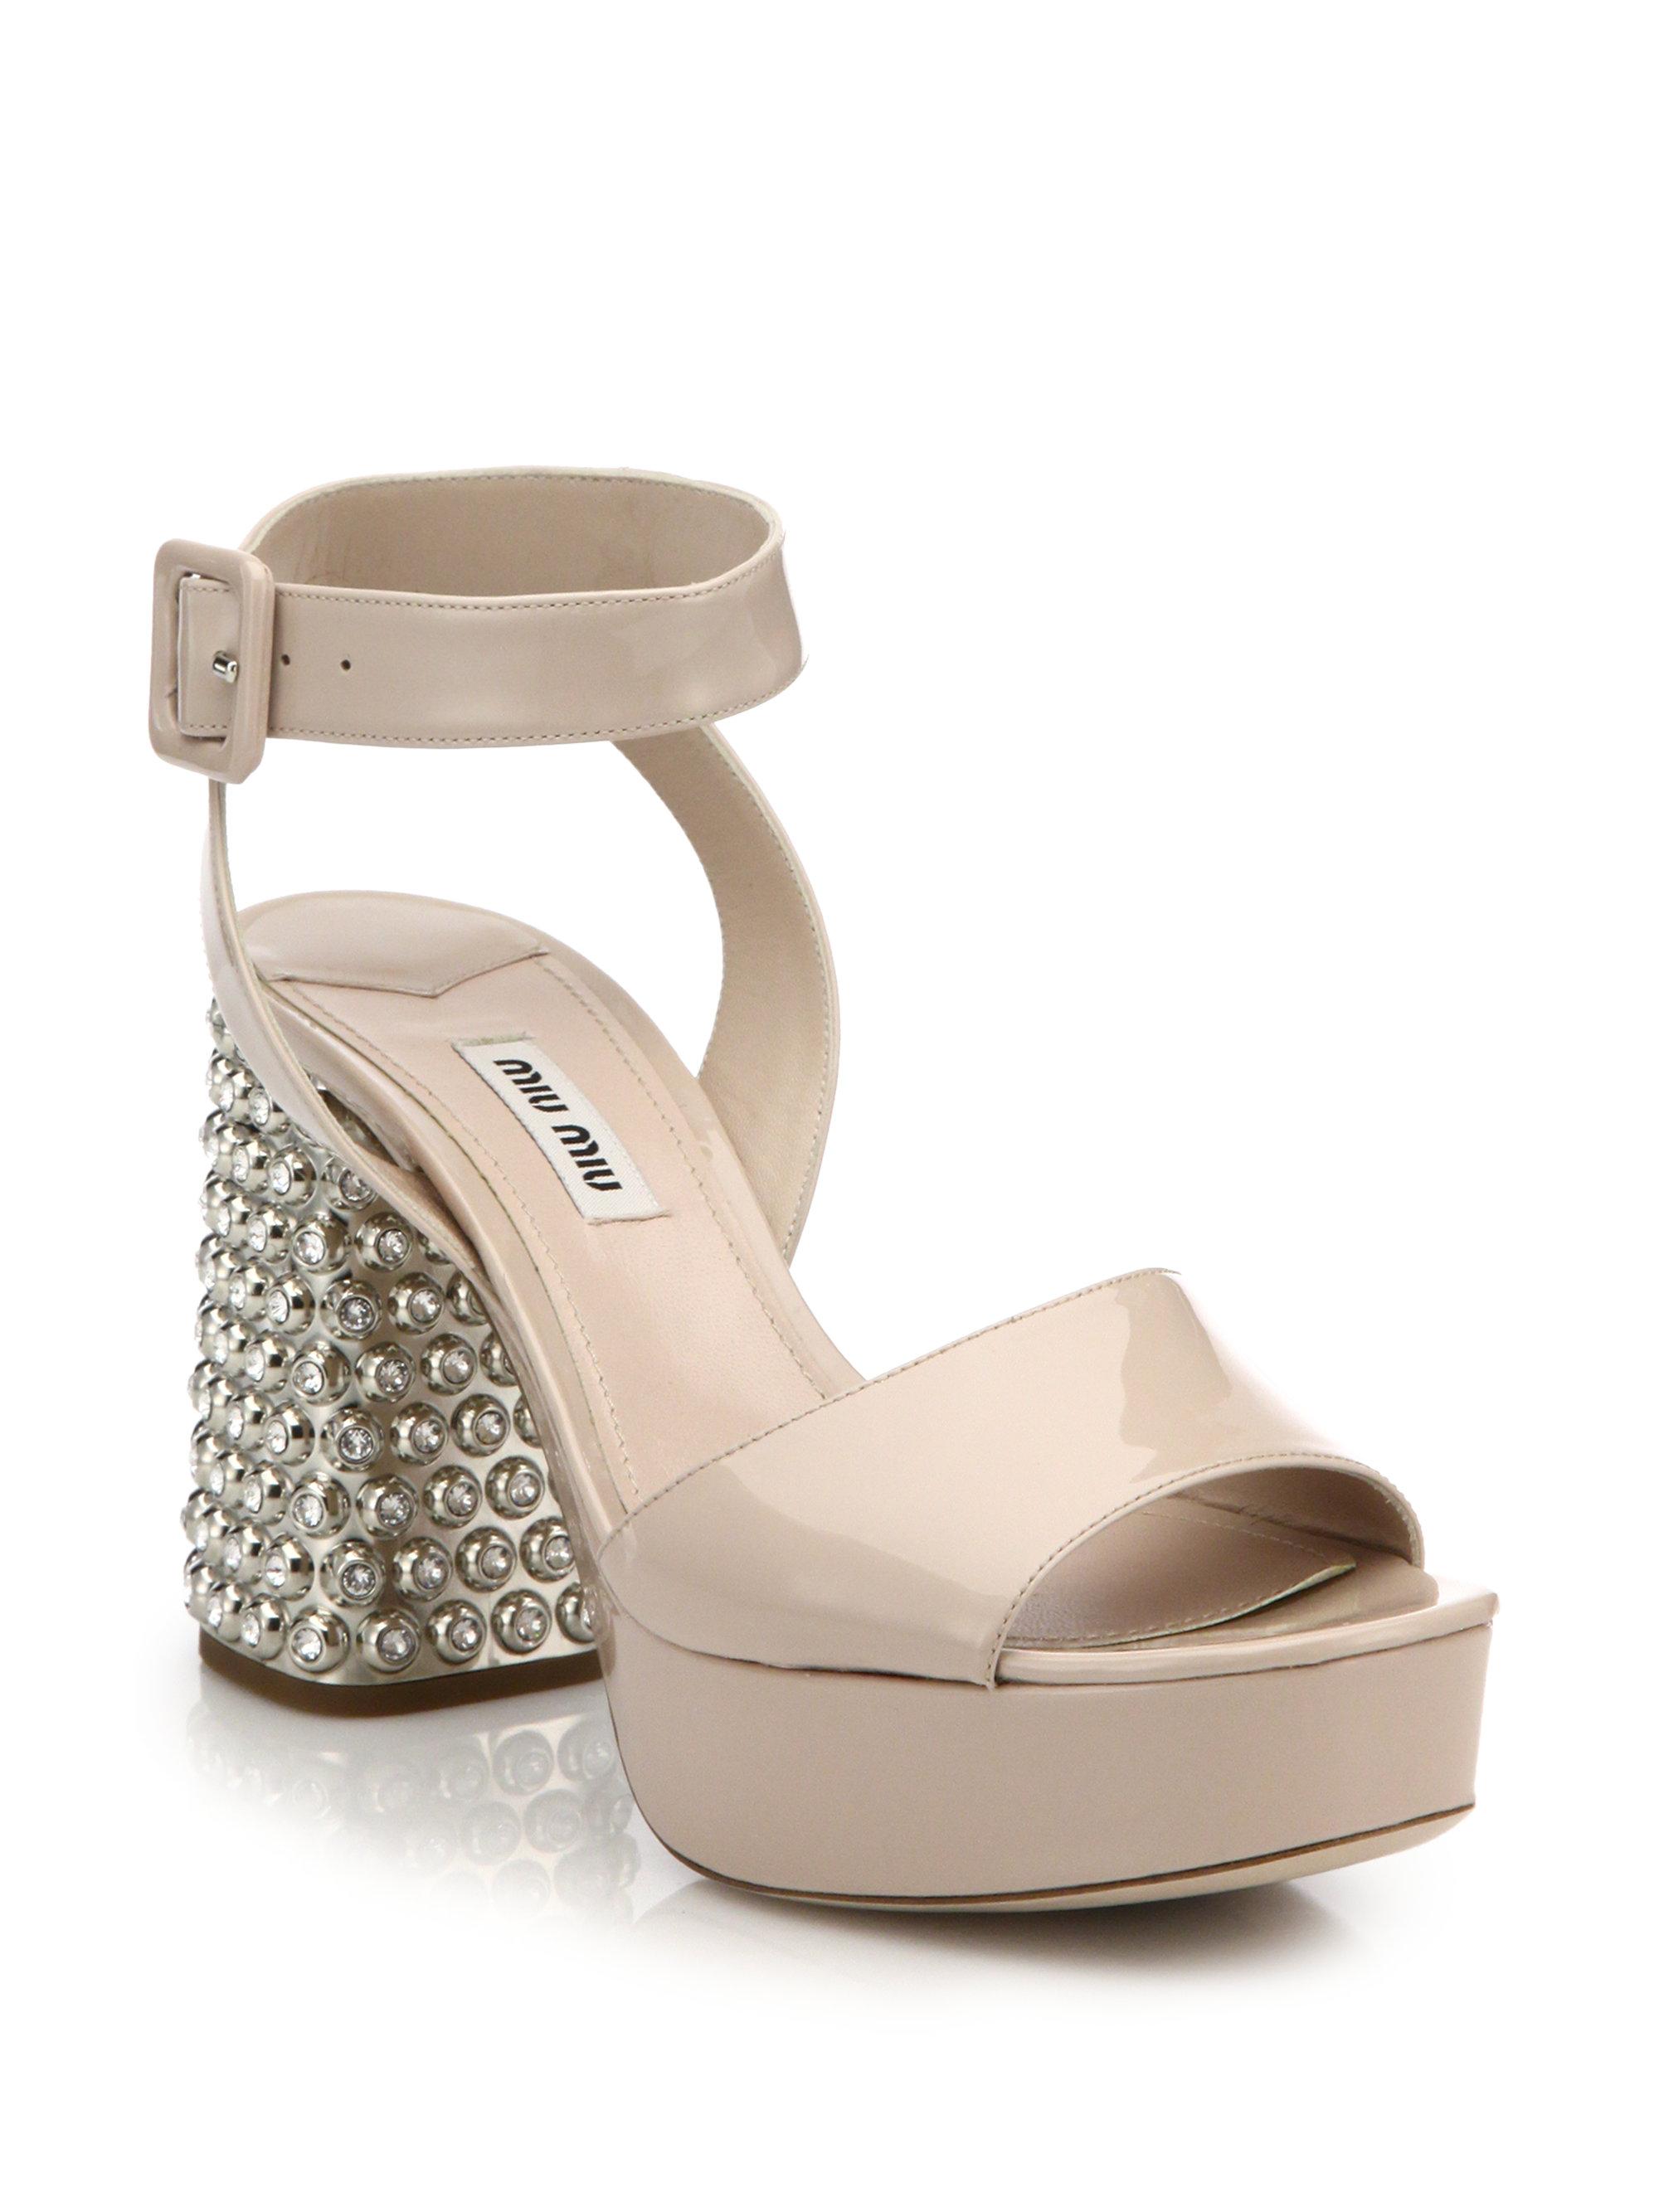 831d3b83a9 Miu Miu Crystal & Metal-heel Patent Leather Sandals in Pink - Lyst